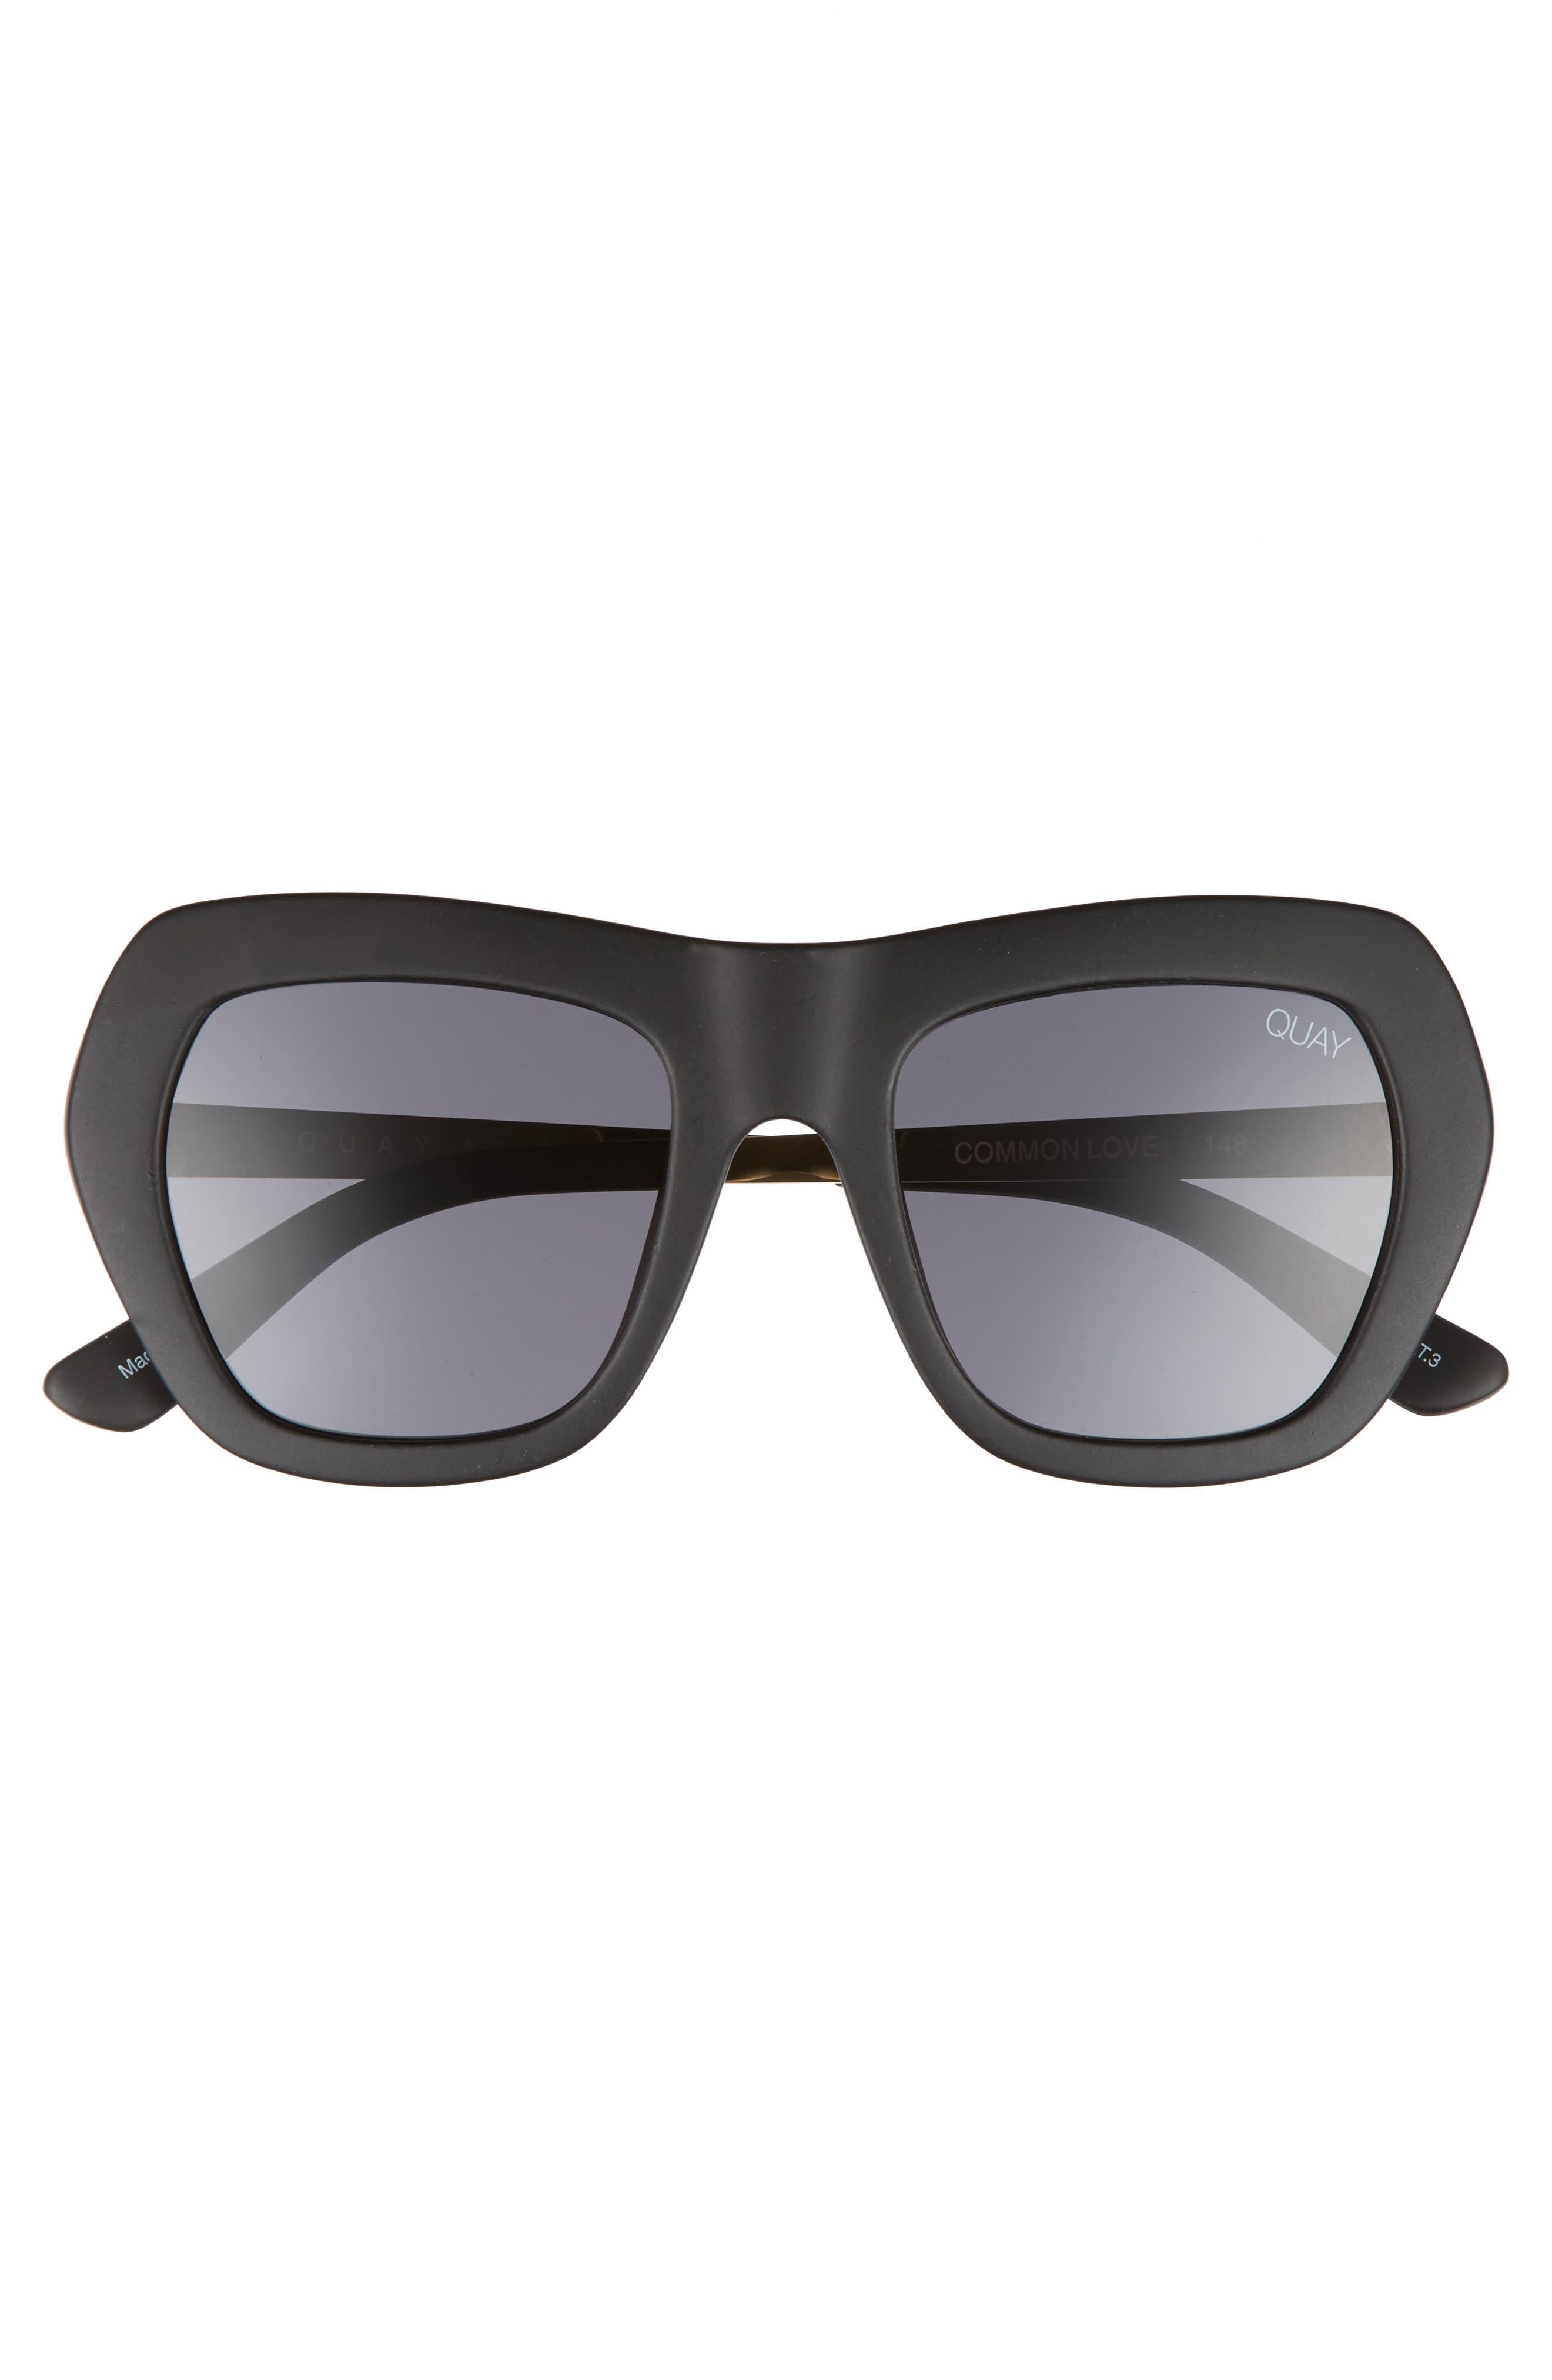 Common Love 53mm Square Sunglasses,                             Alternate thumbnail 5, color,